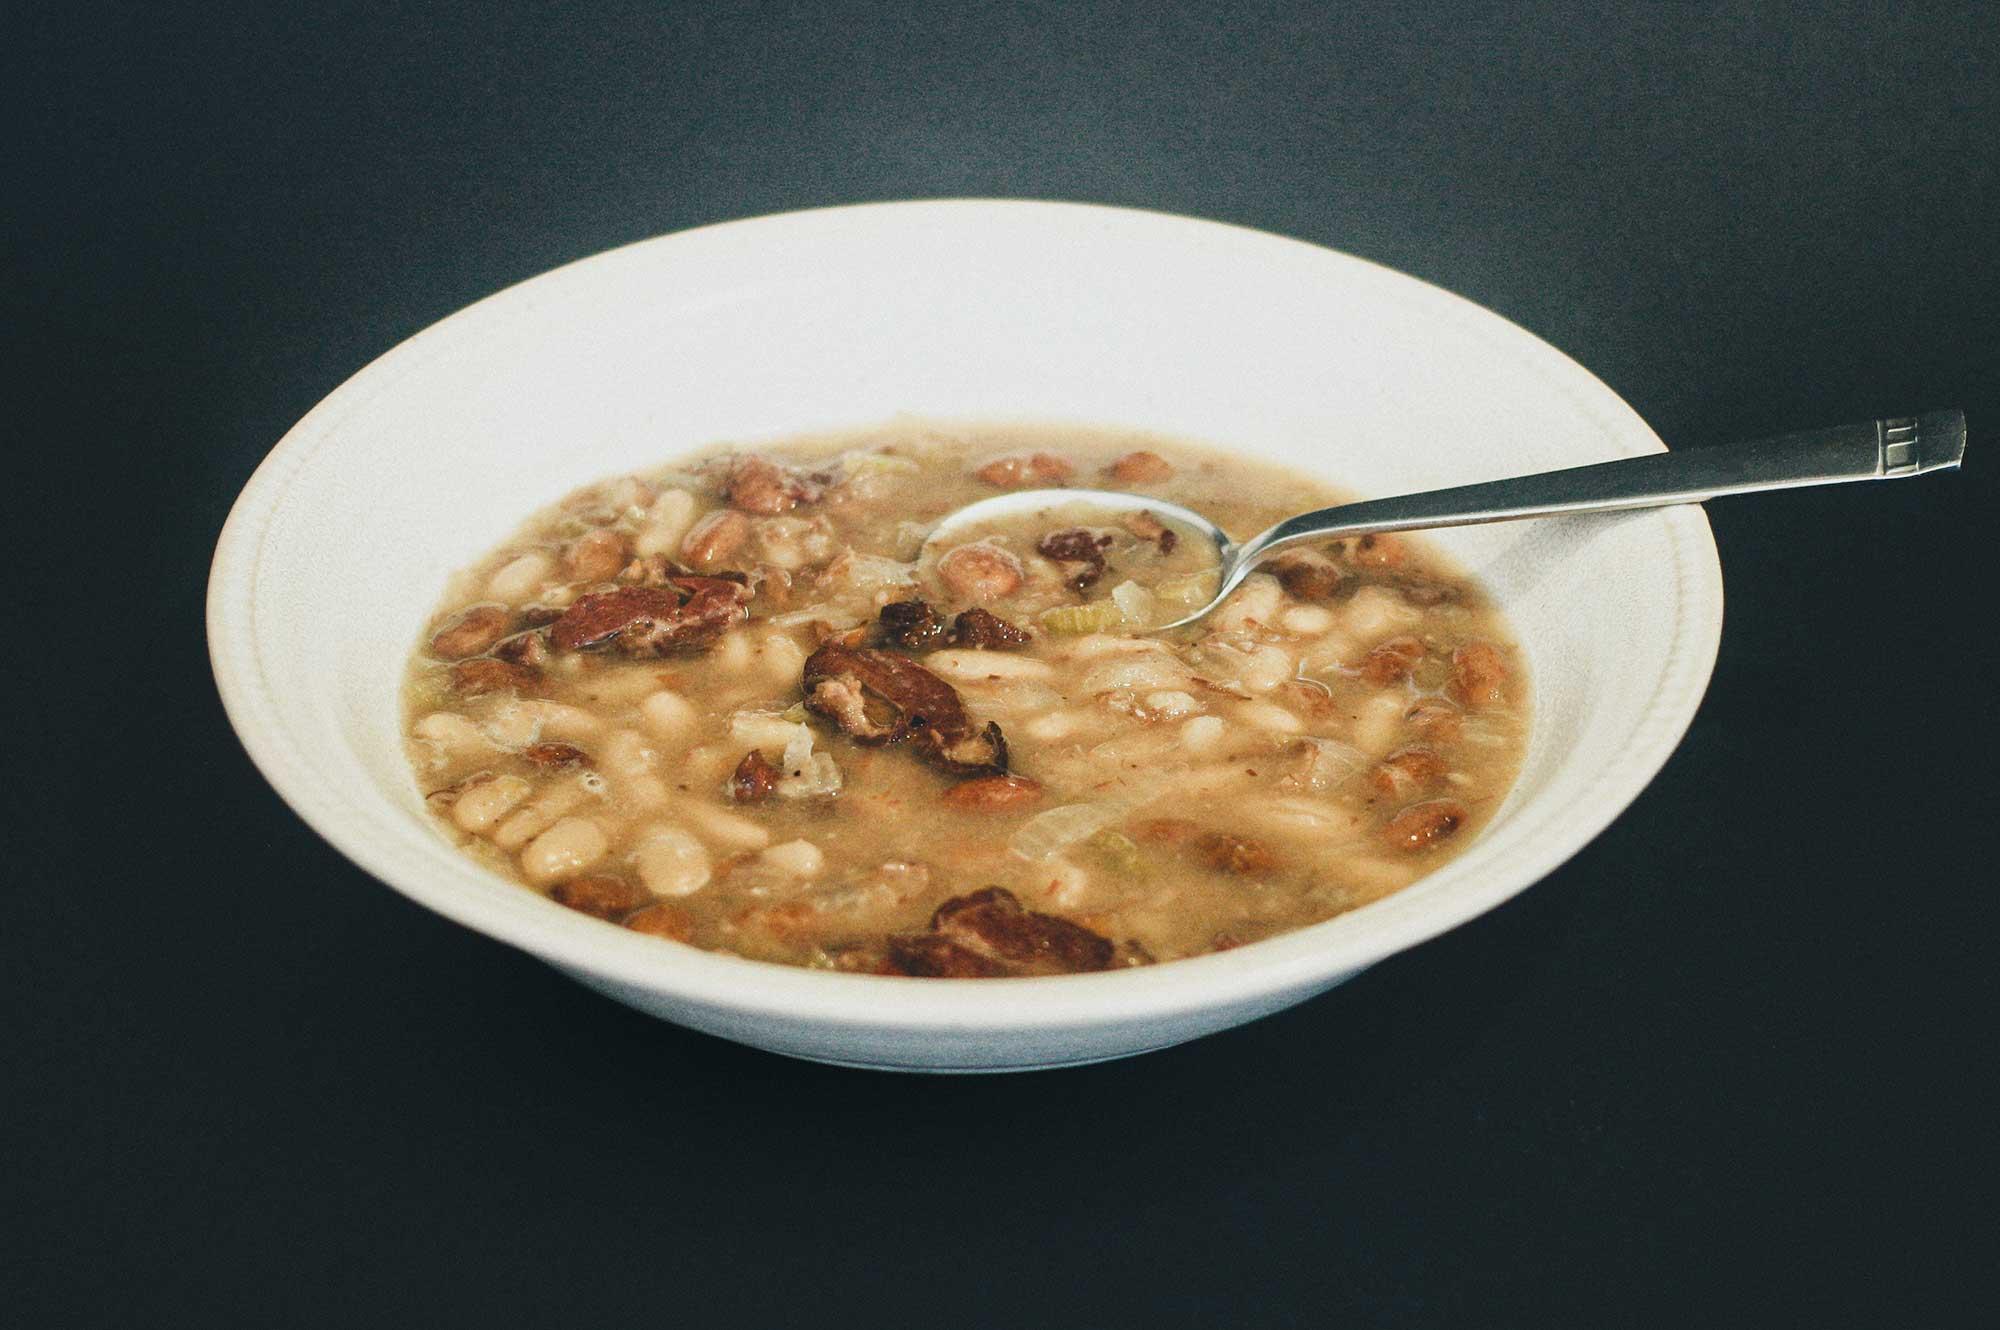 Smoked Lamb & Bean Soup